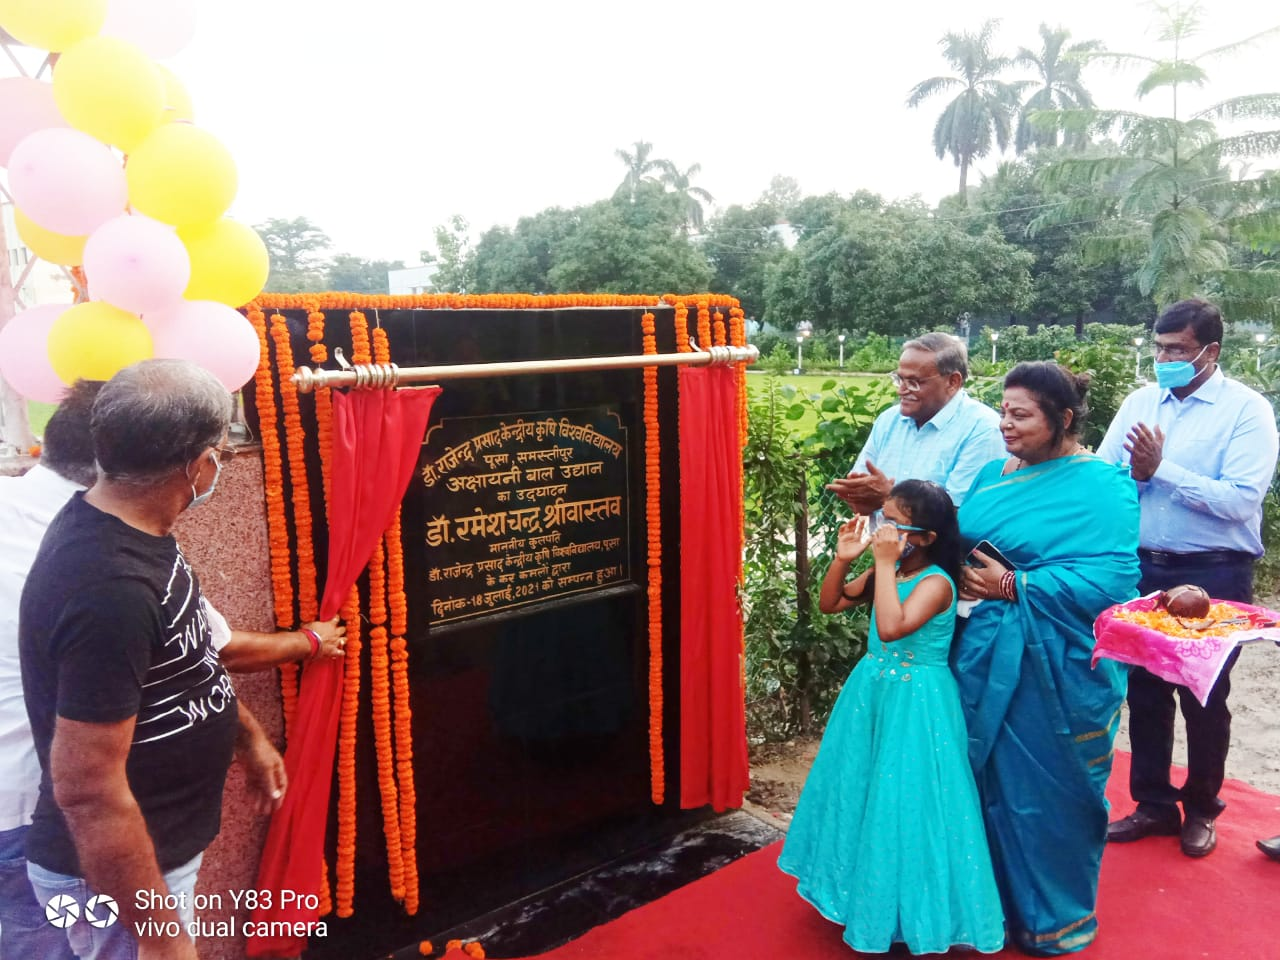 कुलपति डा रमेश चन्द्र श्रीवास्तव ने किया अक्षौहिणी चिल्ड्रेन पार्क का उद्घाटन...